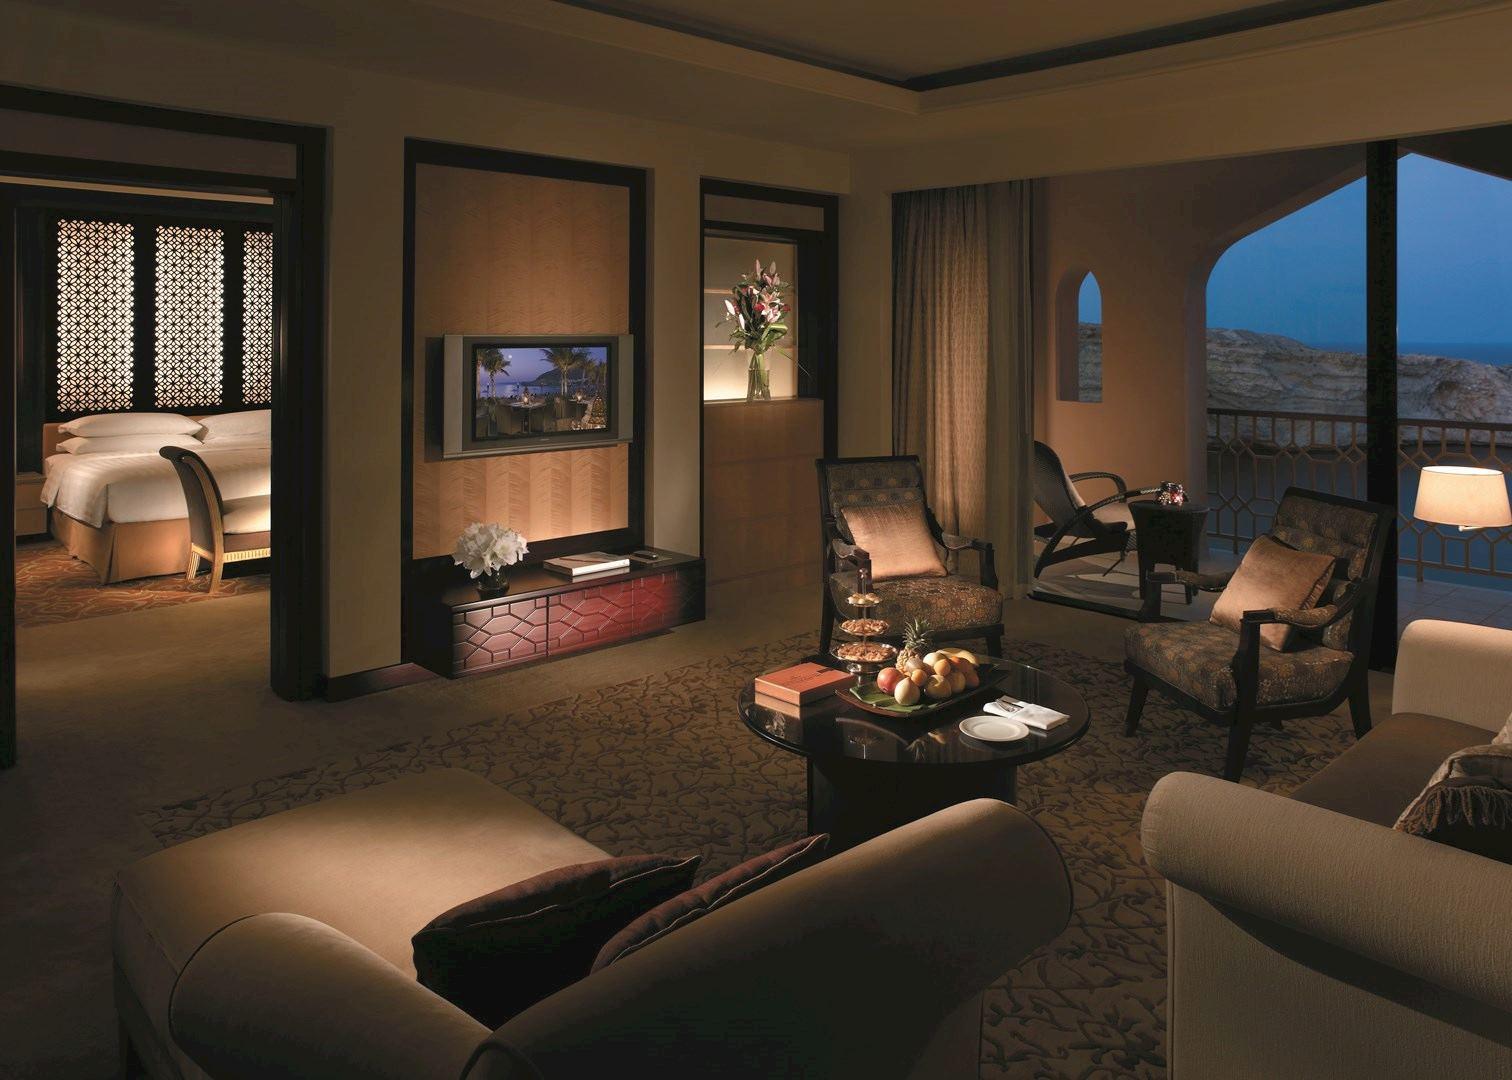 Luxor One Bedroom Luxury Suite Barr Al Jissah Al Husn Wahiba Sands Audley Travel